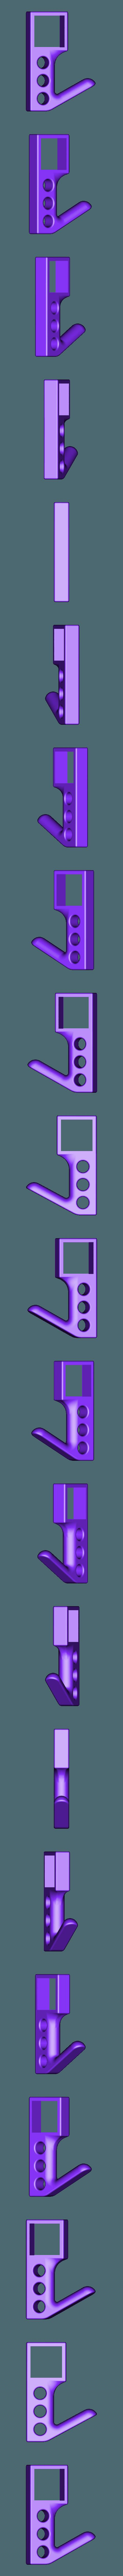 crochet.STL Download free STL file cover holder • 3D printable template, DamDam3D